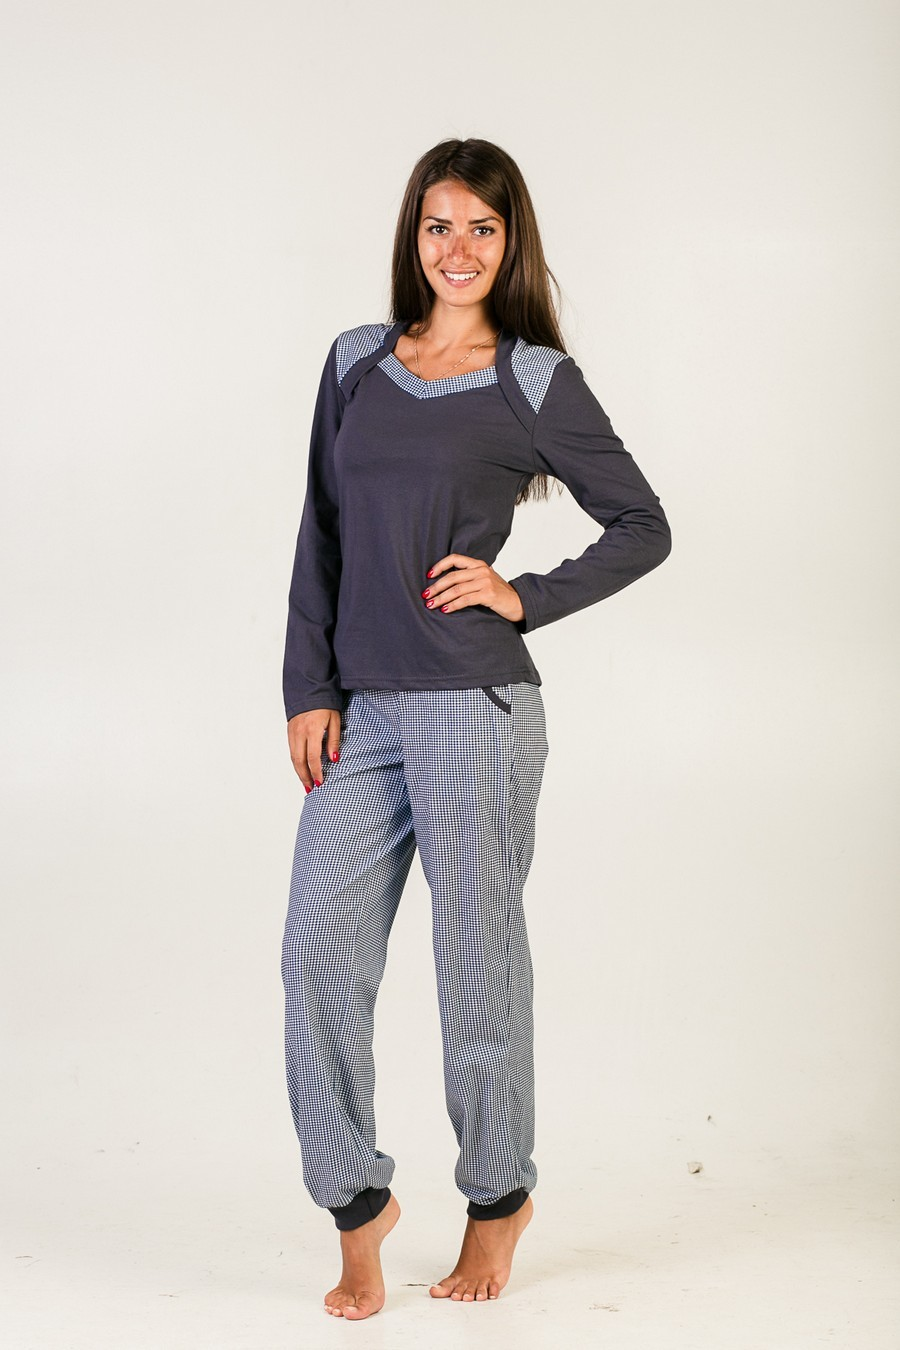 Комплект Меланж Клетка (блузка+брюки)Коллекция ОСЕНЬ-ЗИМА<br><br><br>Размер: Синий